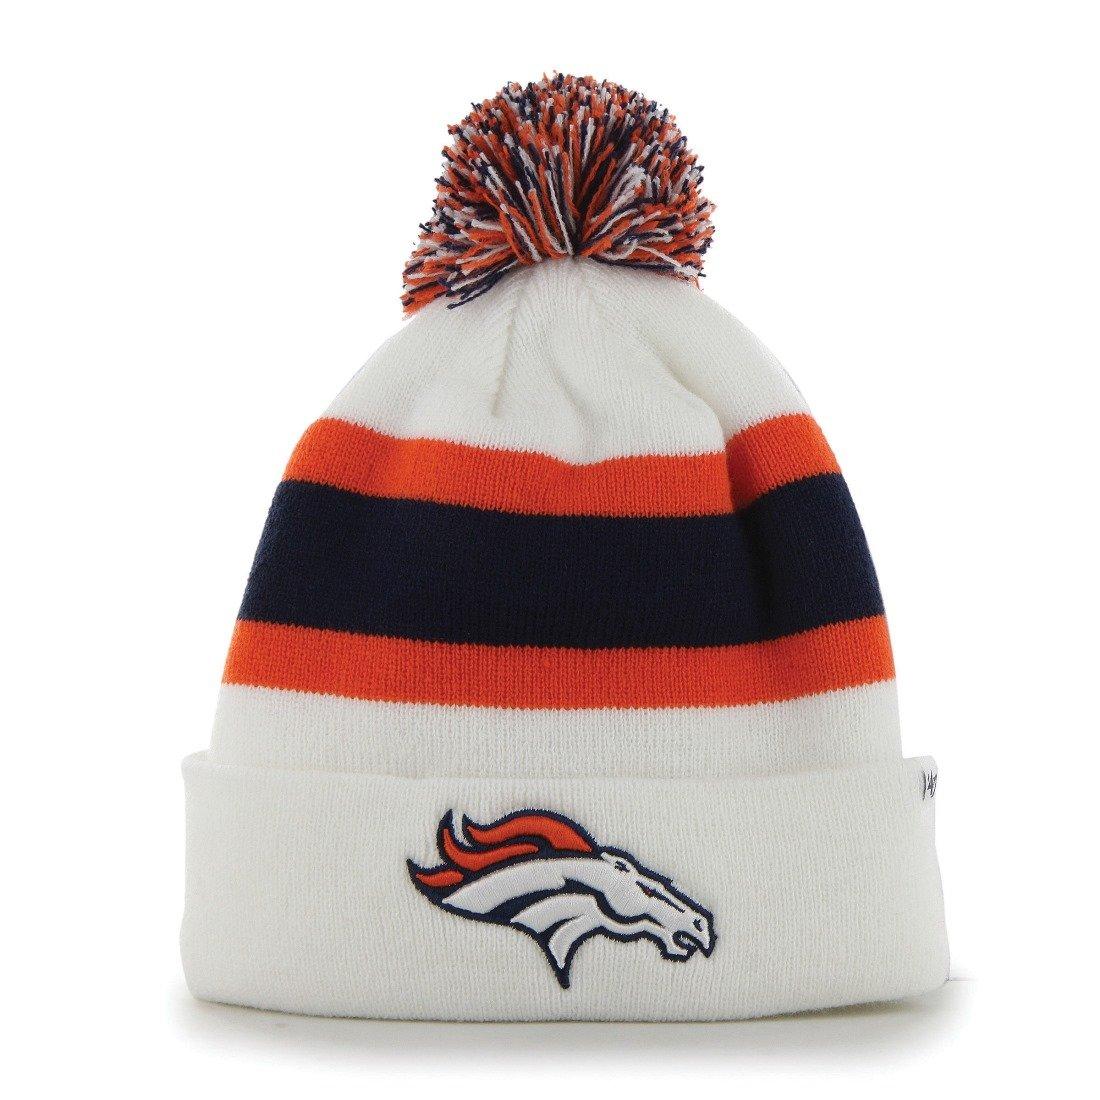 Amazon.com    47 Denver Broncos Brand White Breakaway Knit Hat   Sports    Outdoors 373e0bf21